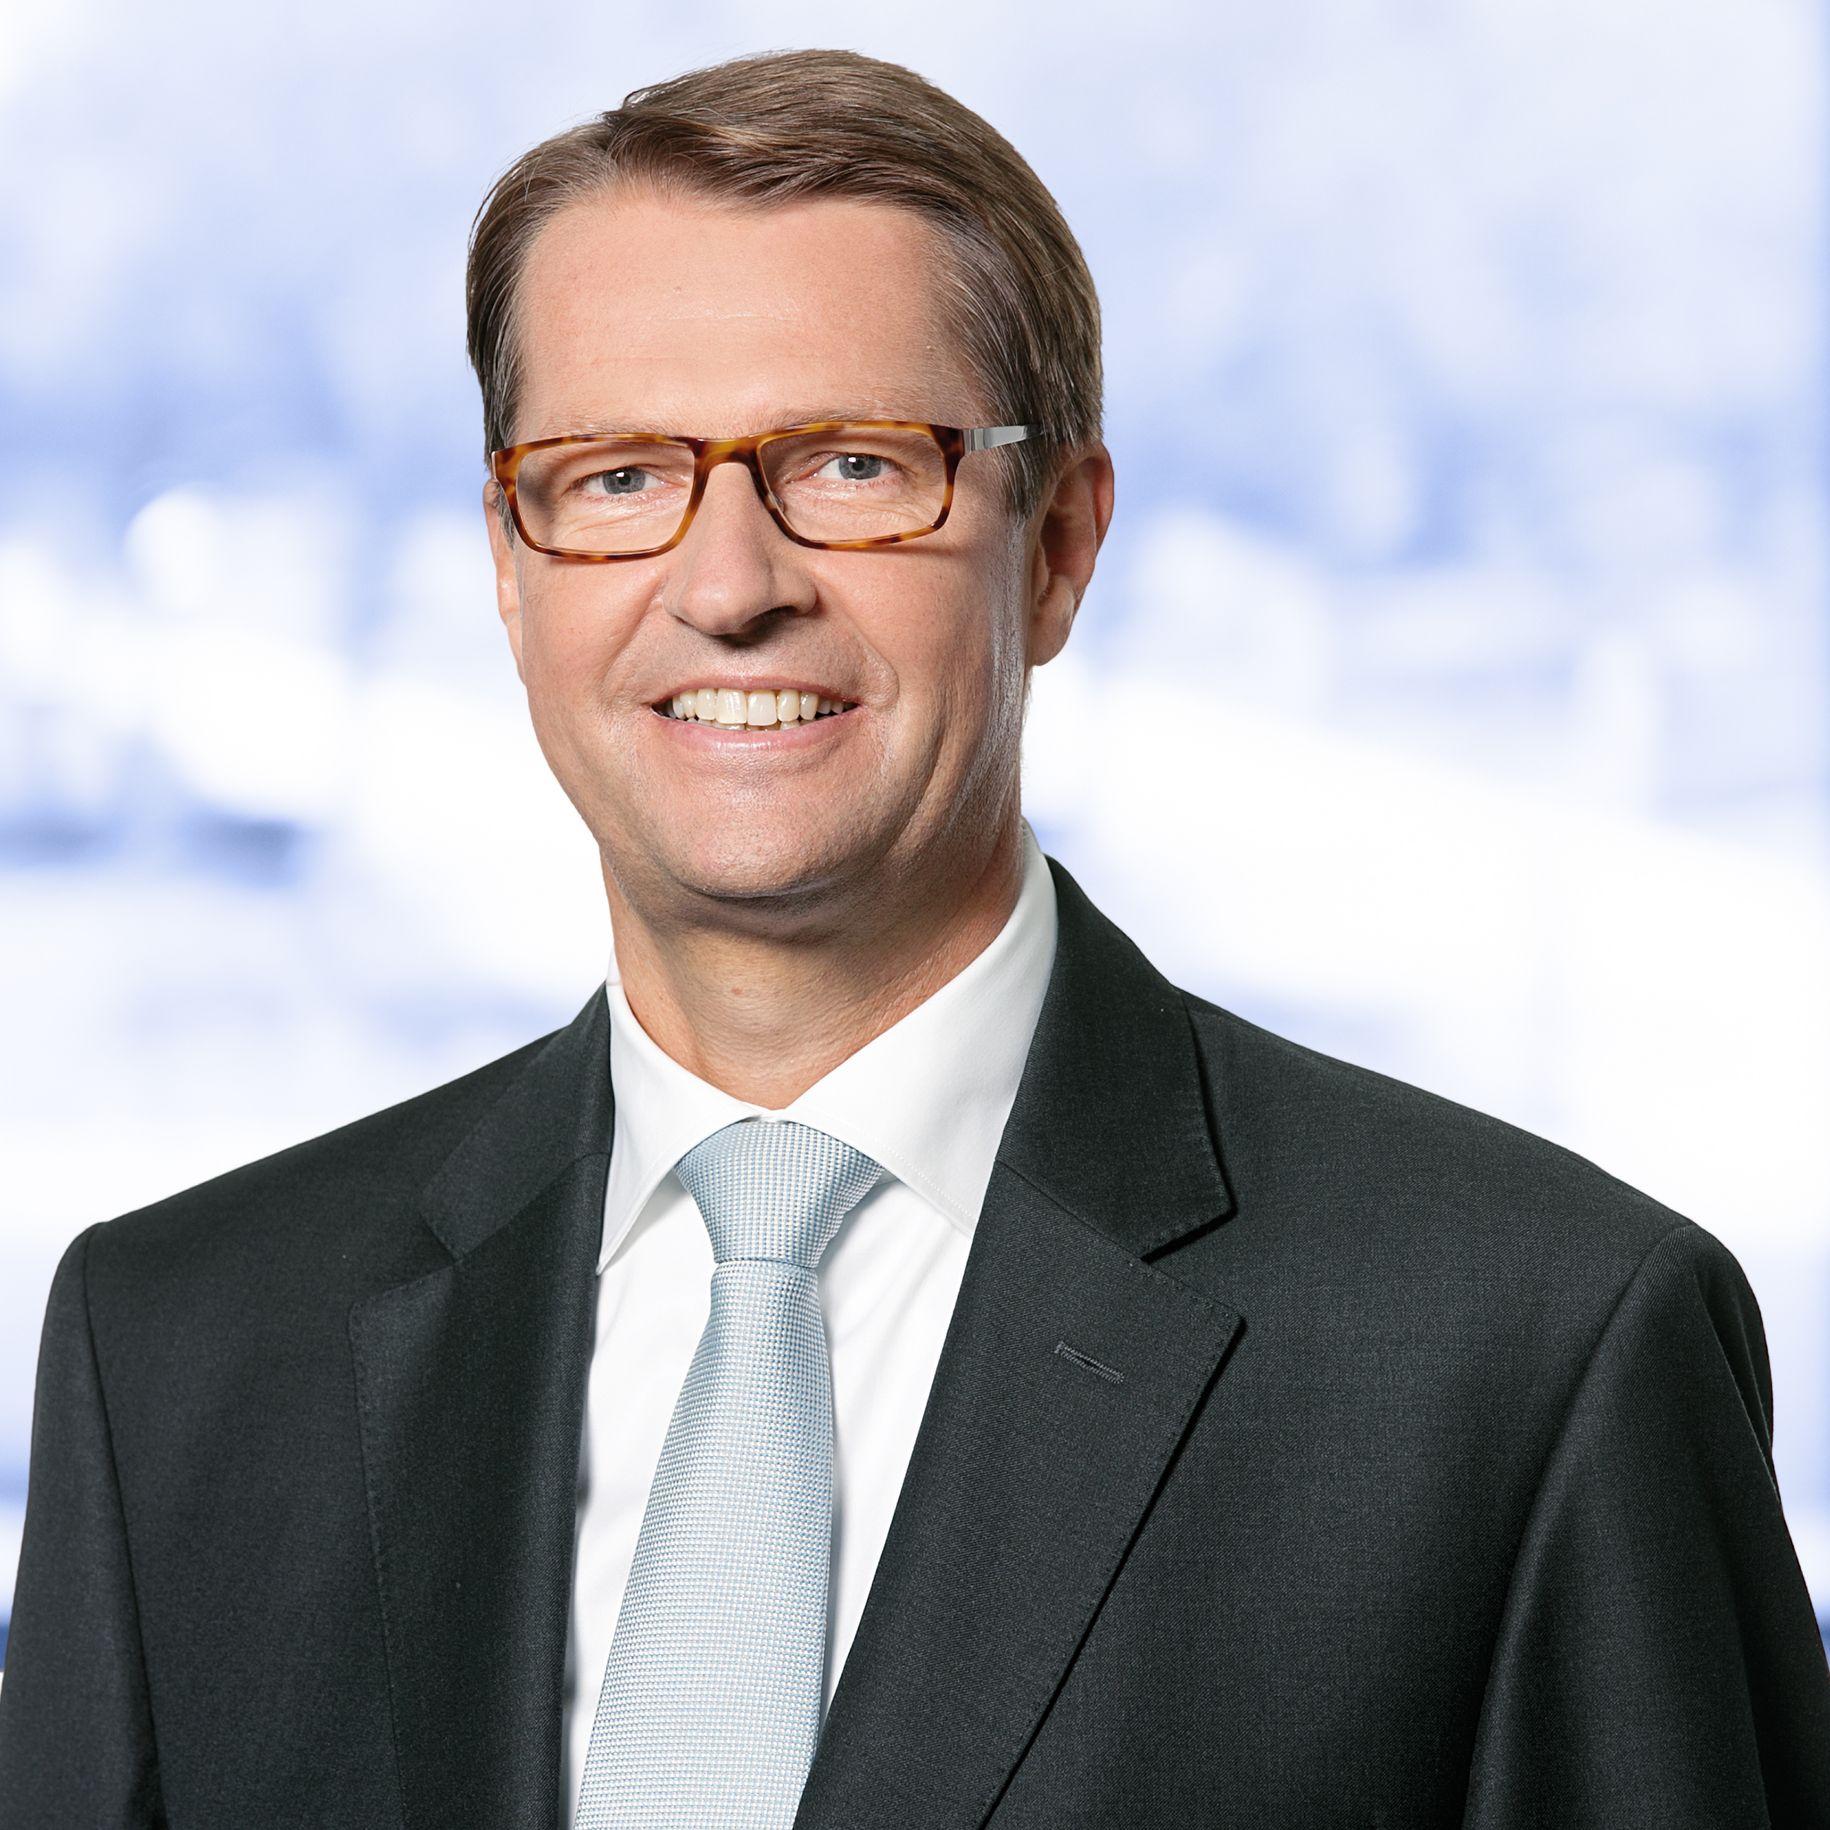 Christian Wendler, Vorstandsvorsitzender, Lenze SE, Hameln